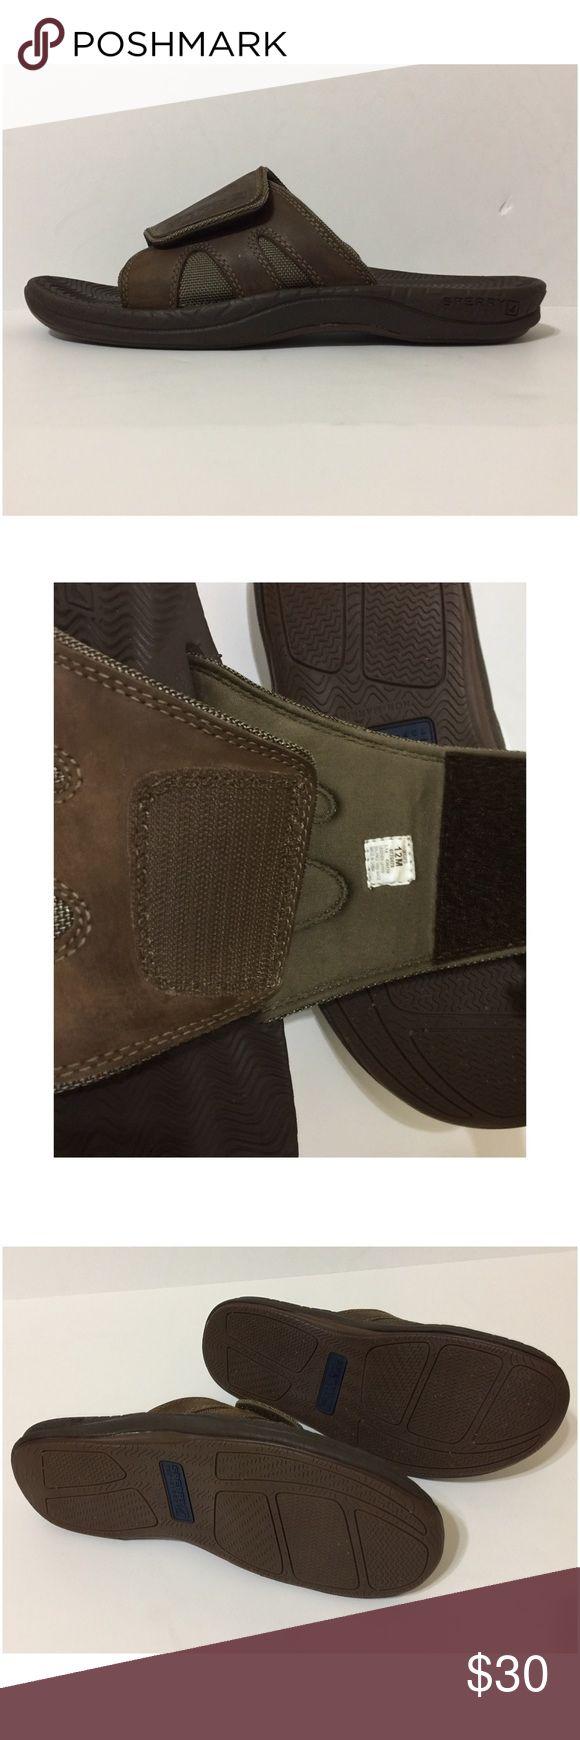 Sperry Top-Sider Men's Slip On Sandals Size 12 Brown • Velcro Top To Adjust For Width • Cushioned Insoles • Size 12 • Slide On Sperry Top-Sider Shoes Sandals & Flip-Flops